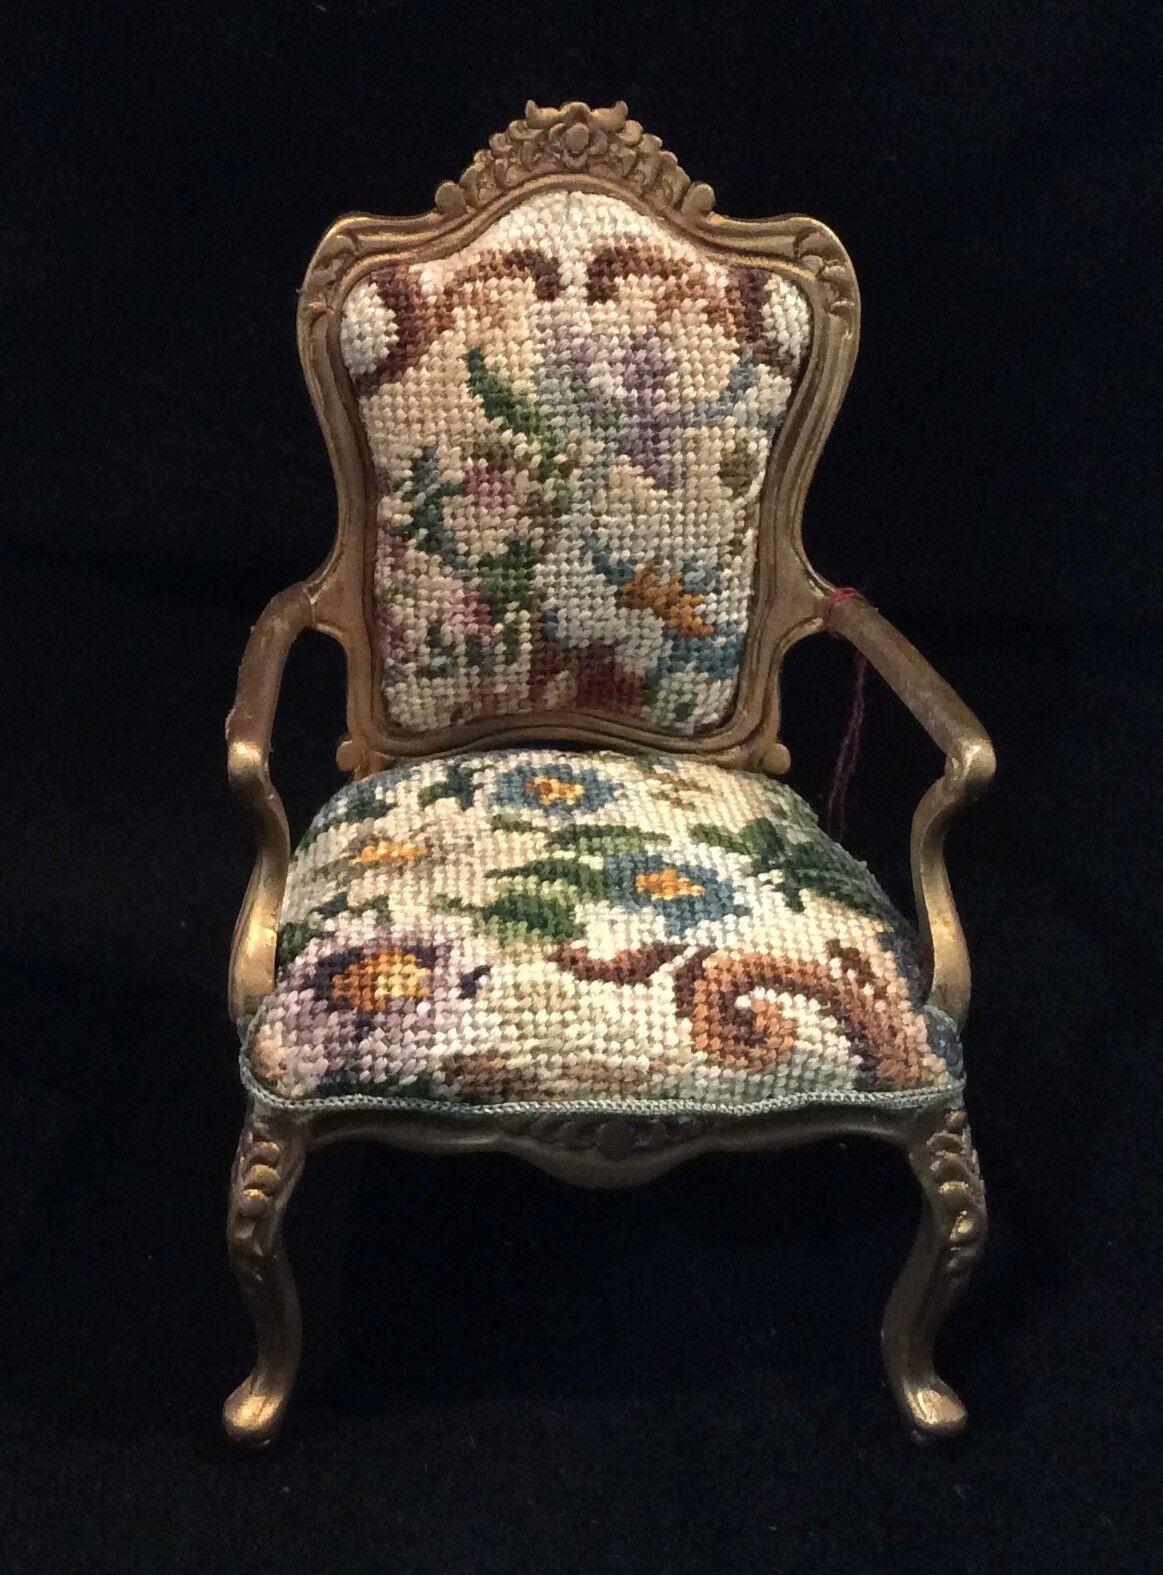 JBM Miniature Dollhouse Arm Chair with antique petit point - needlepoint.